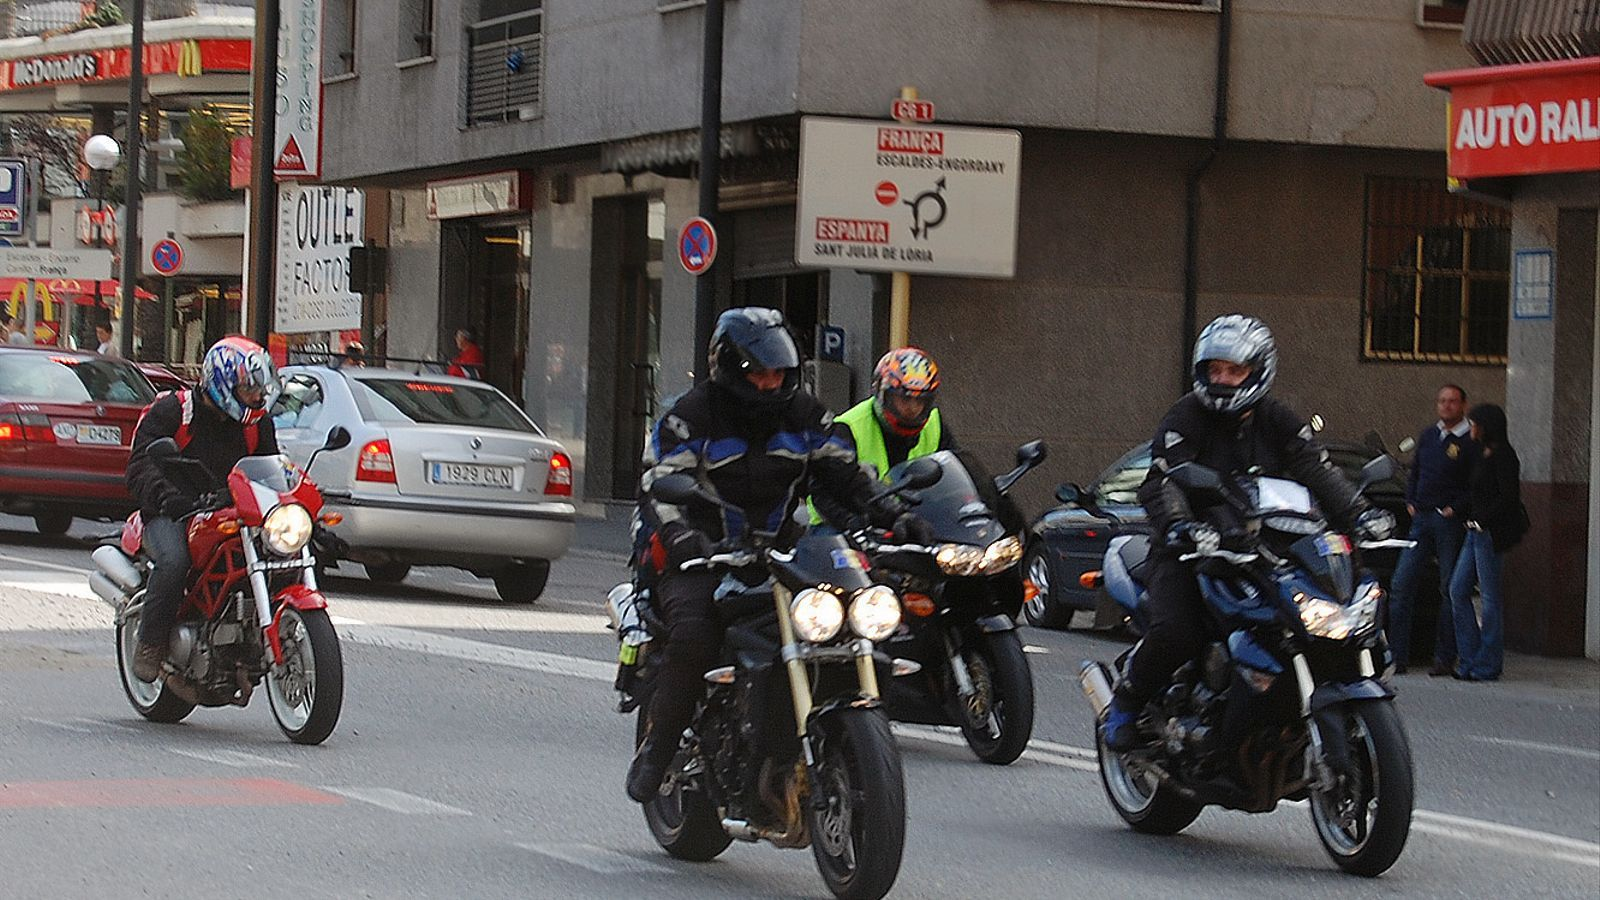 La policia multa 126 motoristes en dues setmanes